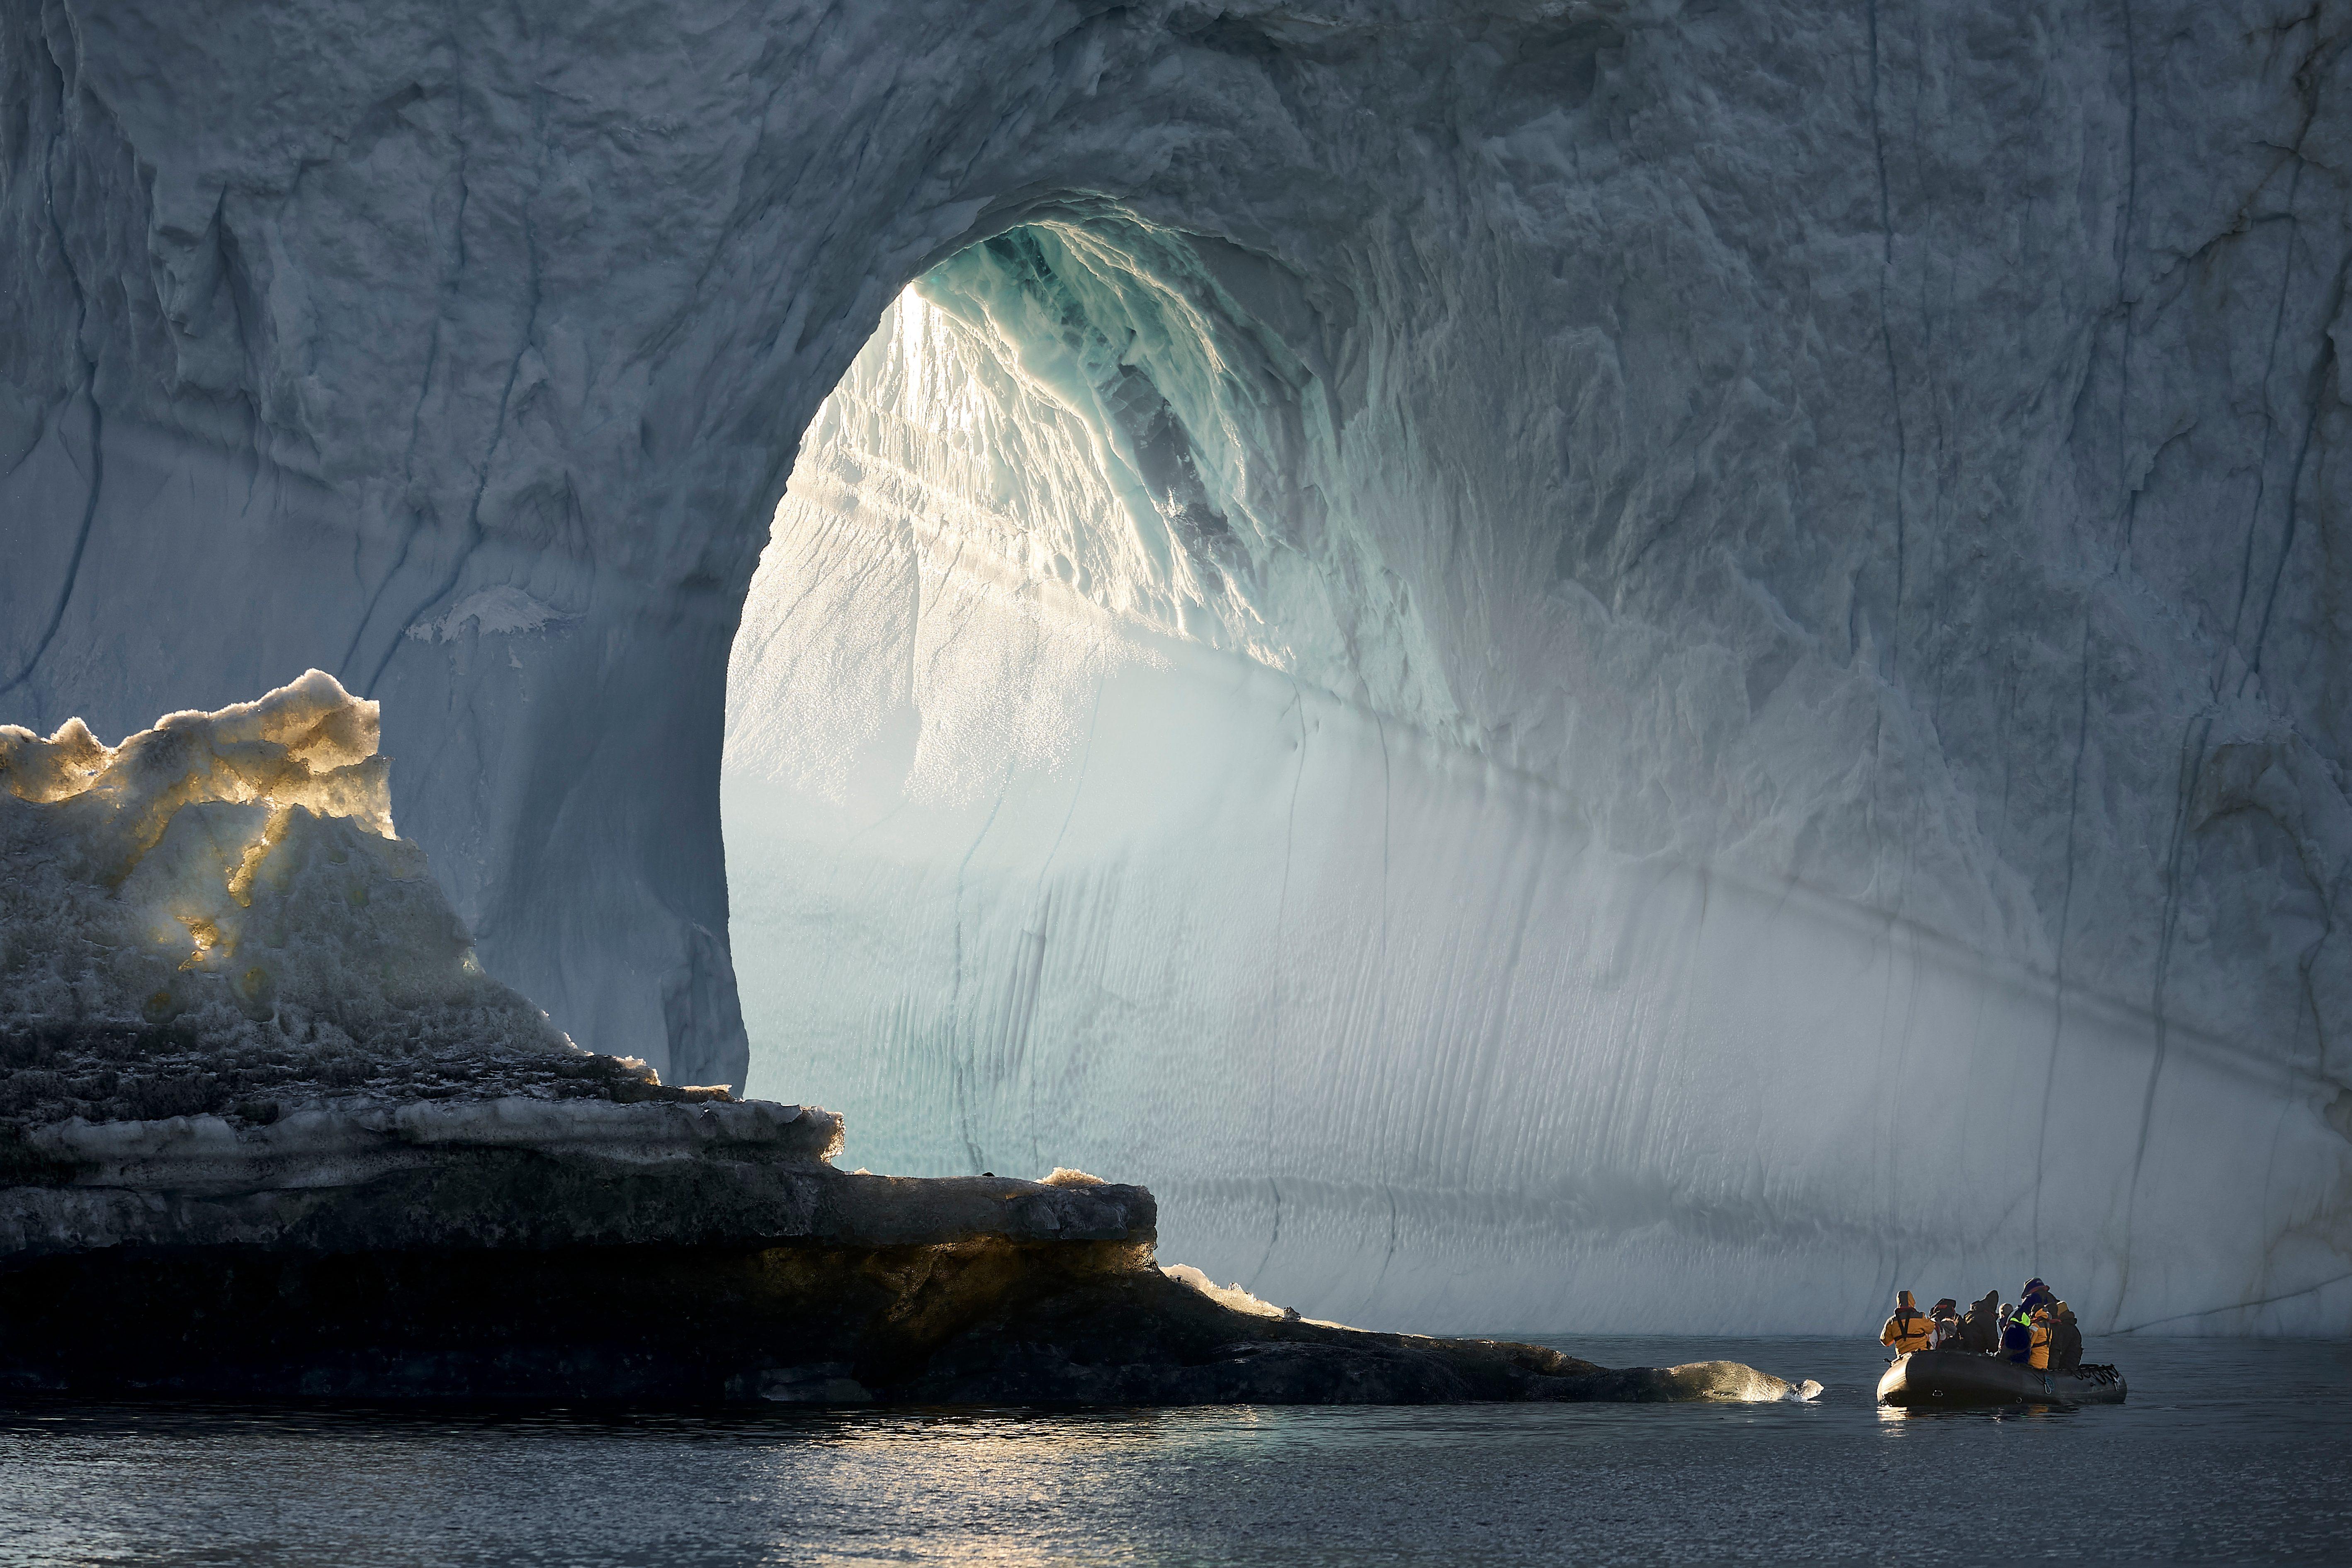 Exploring icebergs, Scoresbysund, Greenland